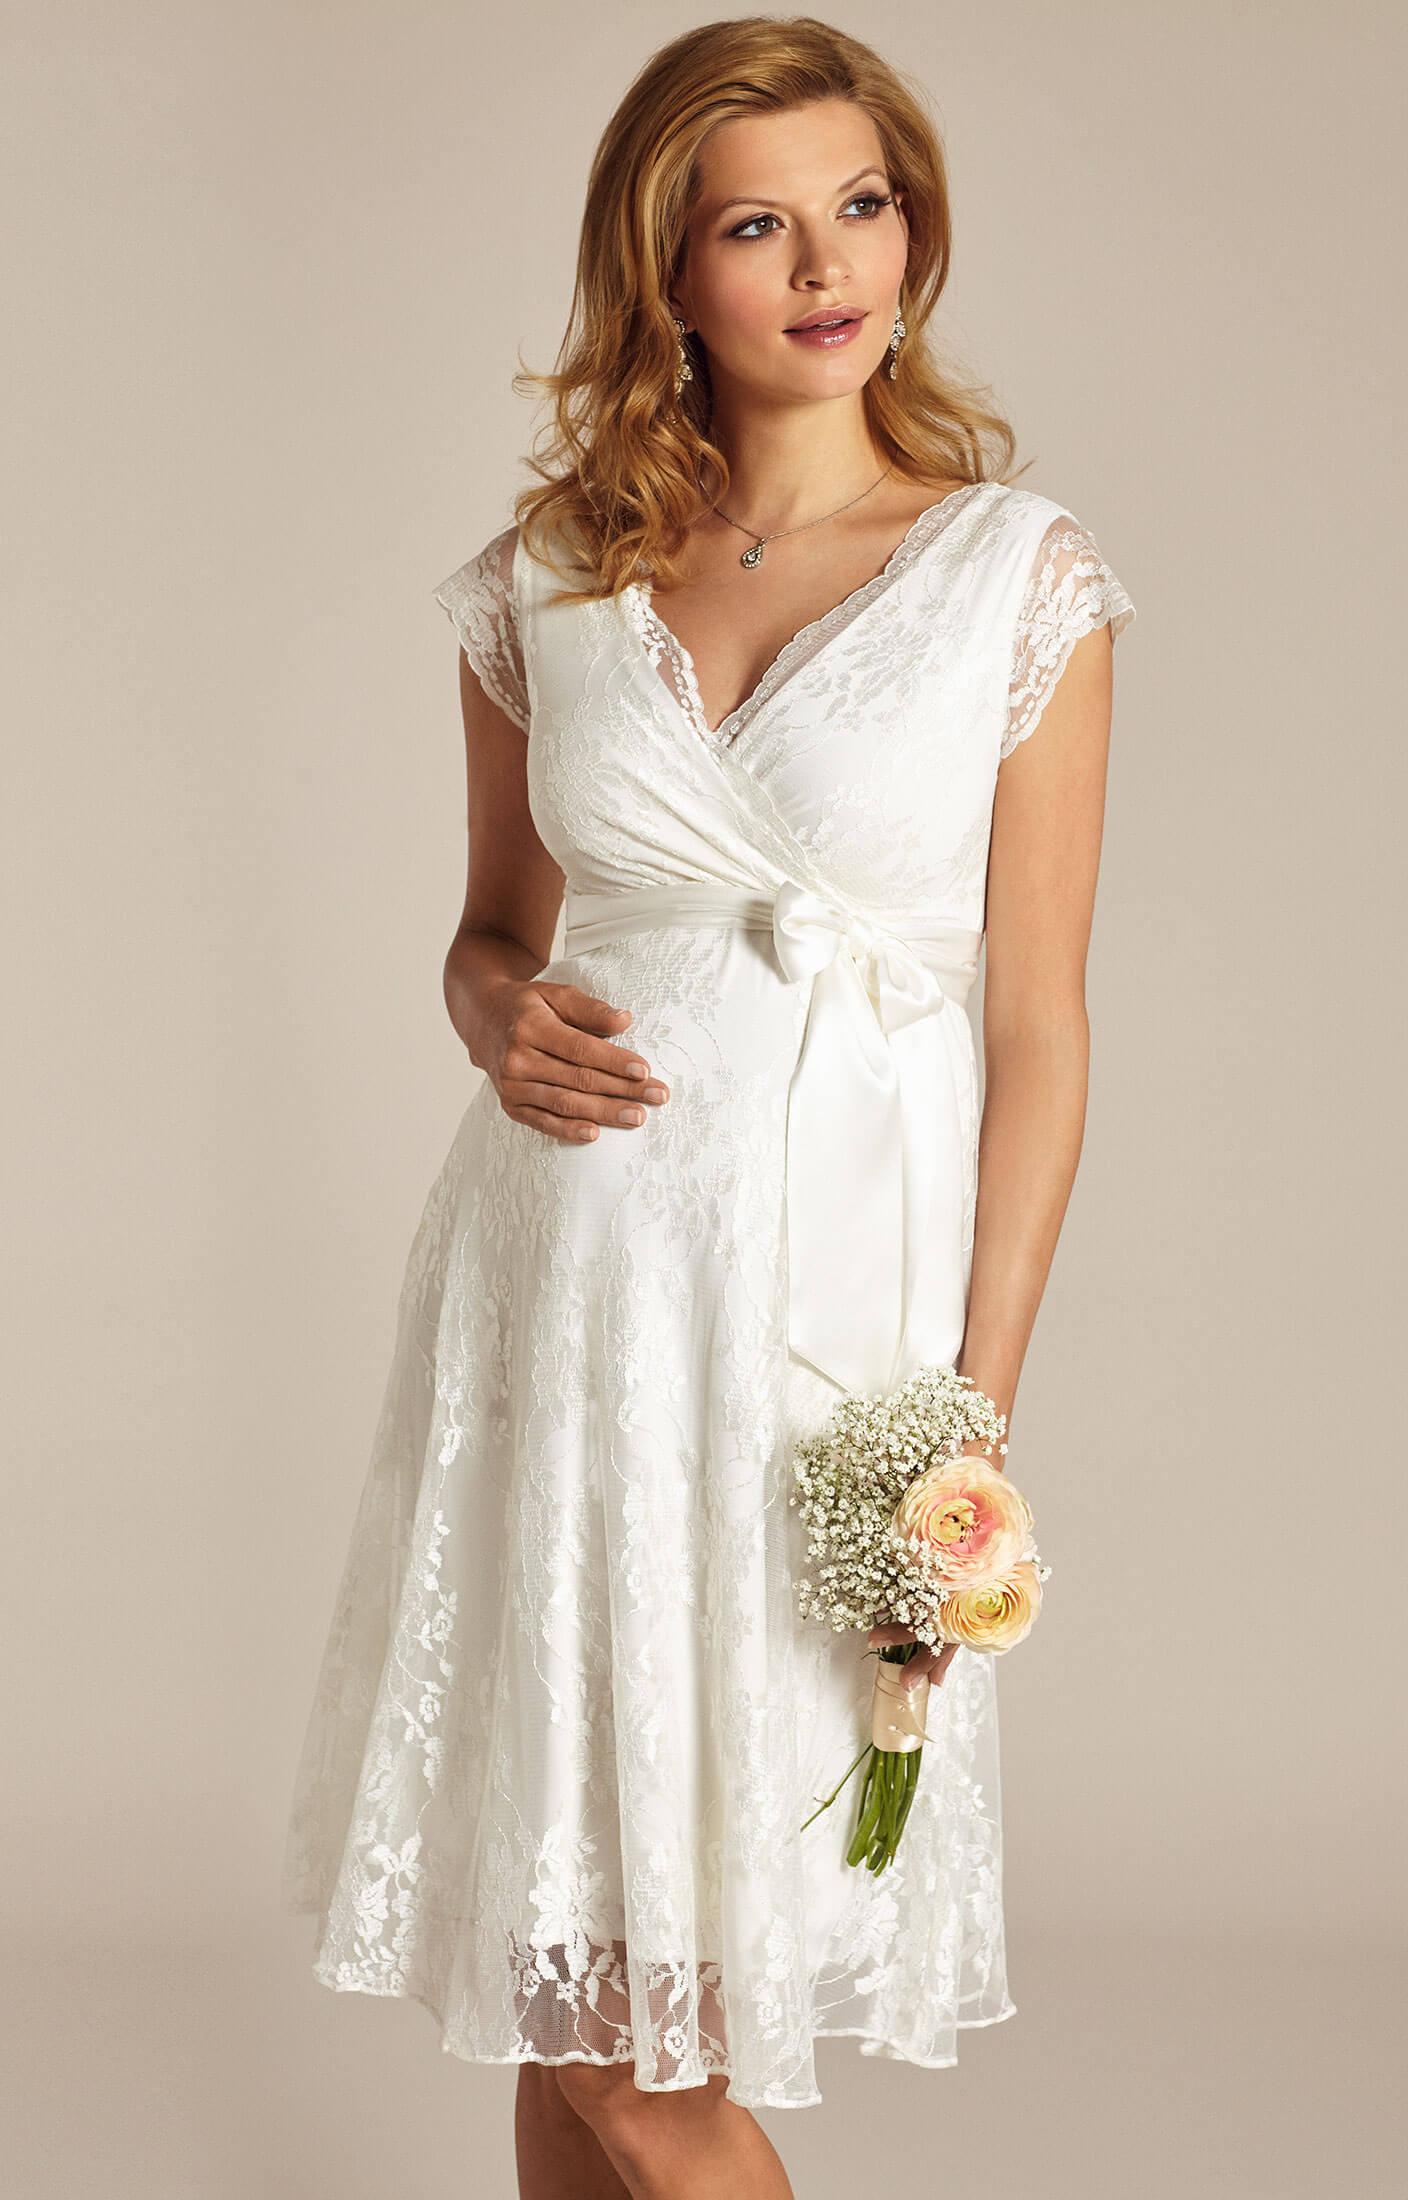 Formal Spektakulär Abendkleid Ivory Stylish13 Wunderbar Abendkleid Ivory Vertrieb